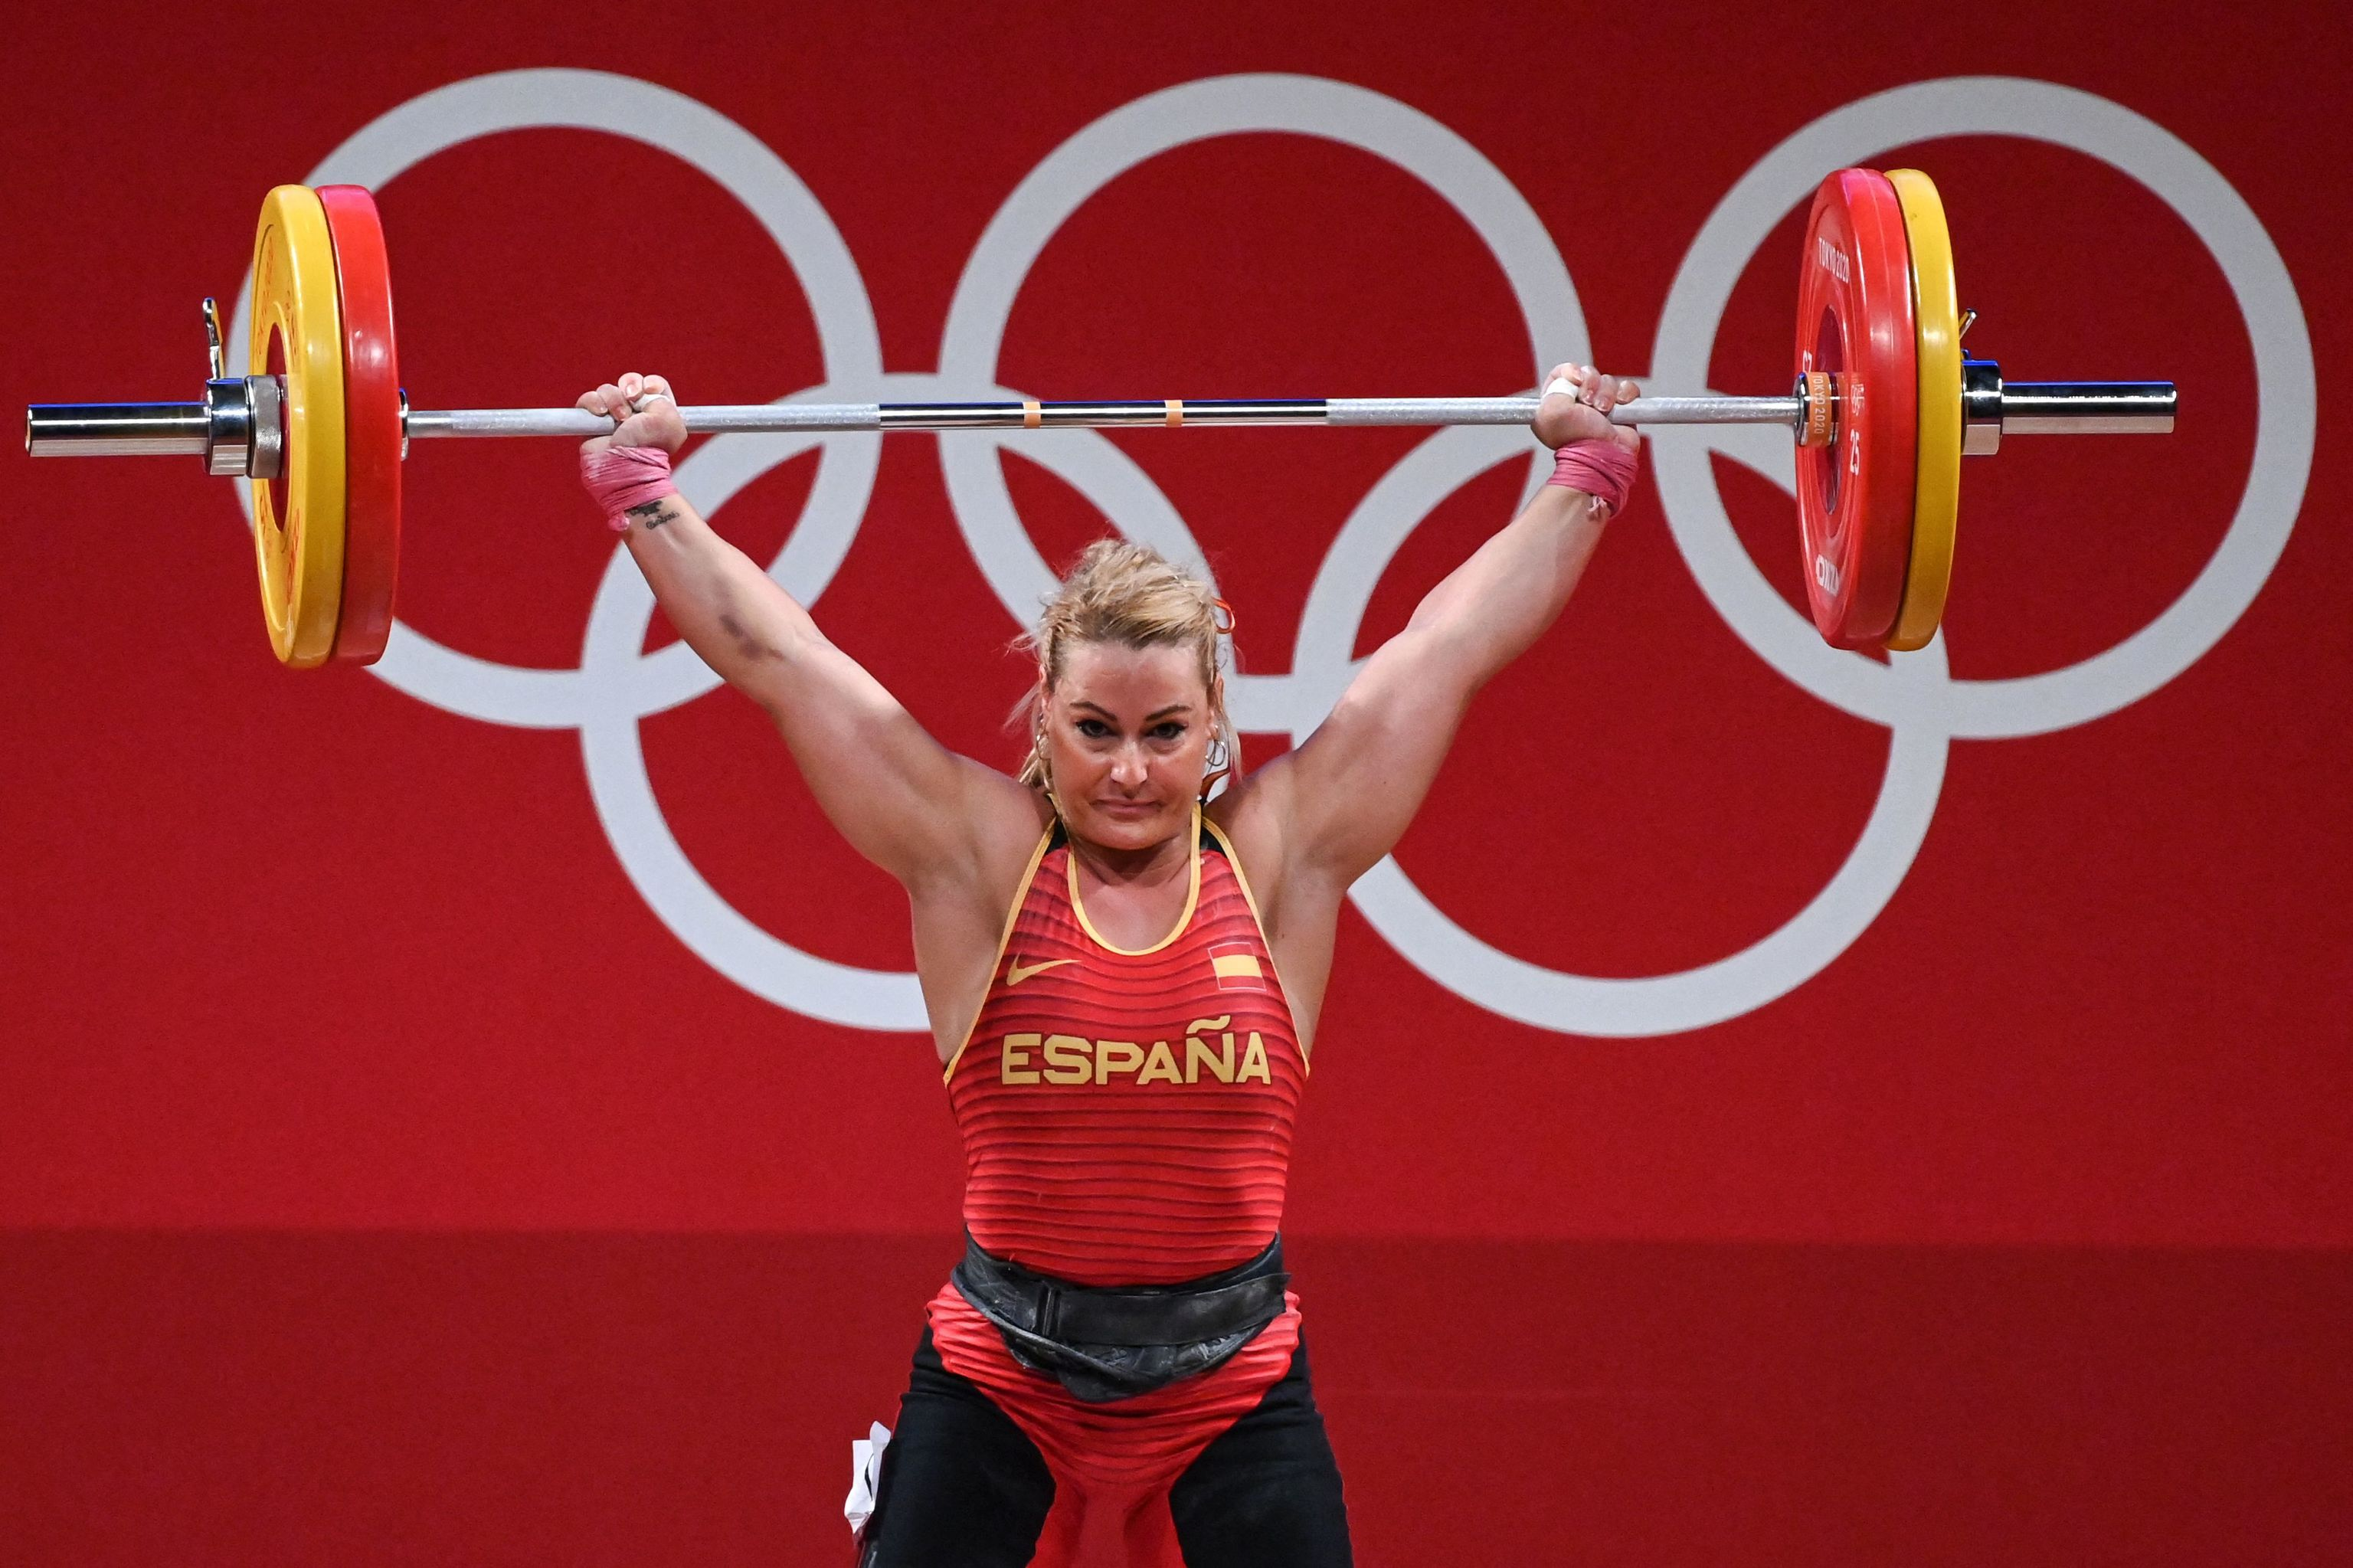 La halterófila está buscando otro triunfo olímpico.